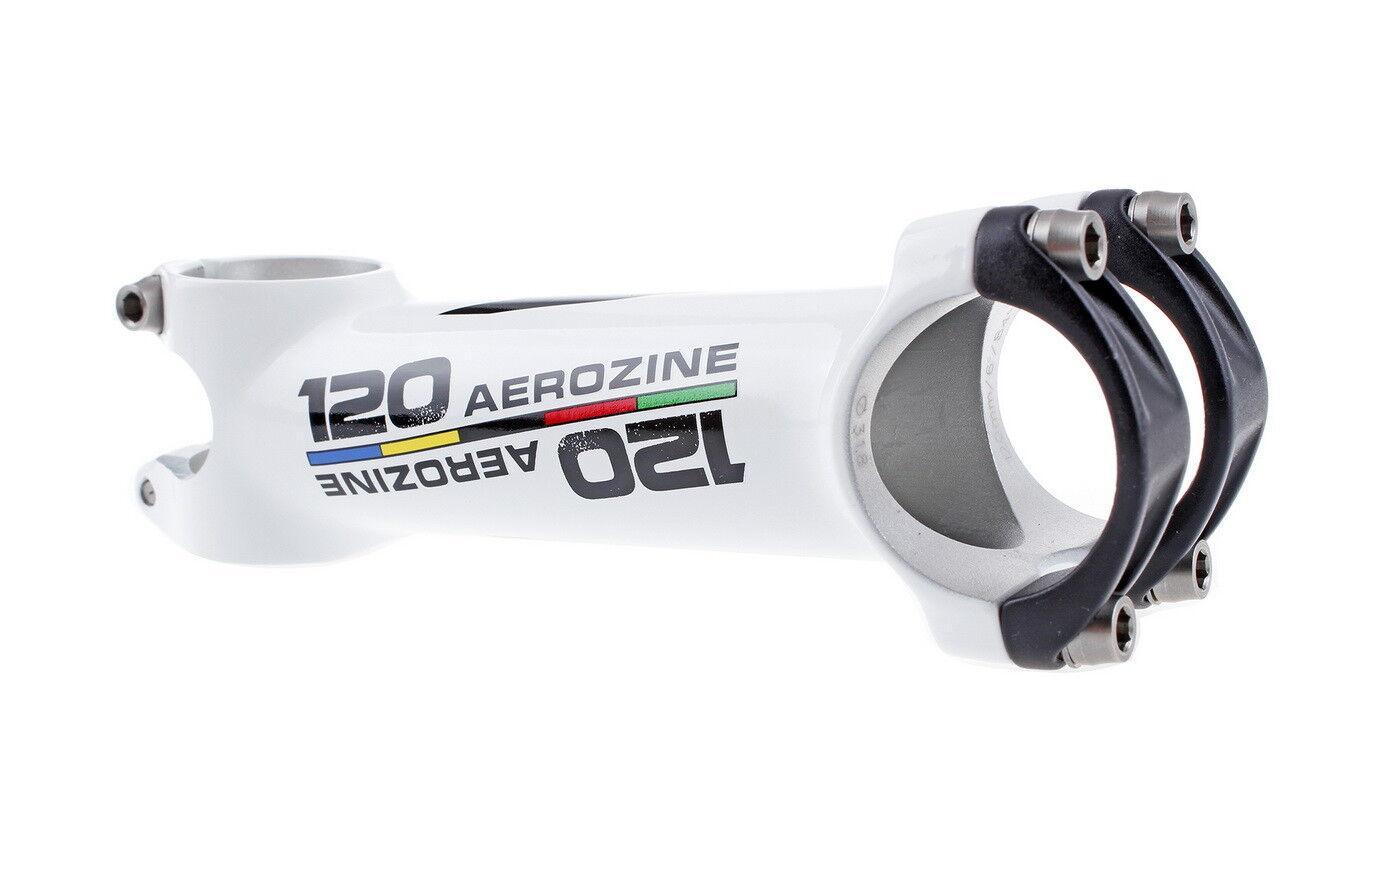 Aerozine XS7 Road MTB Bicycle Bike AL7050 Stem w Titanium  bolts 6D 120mm White  hot limited edition